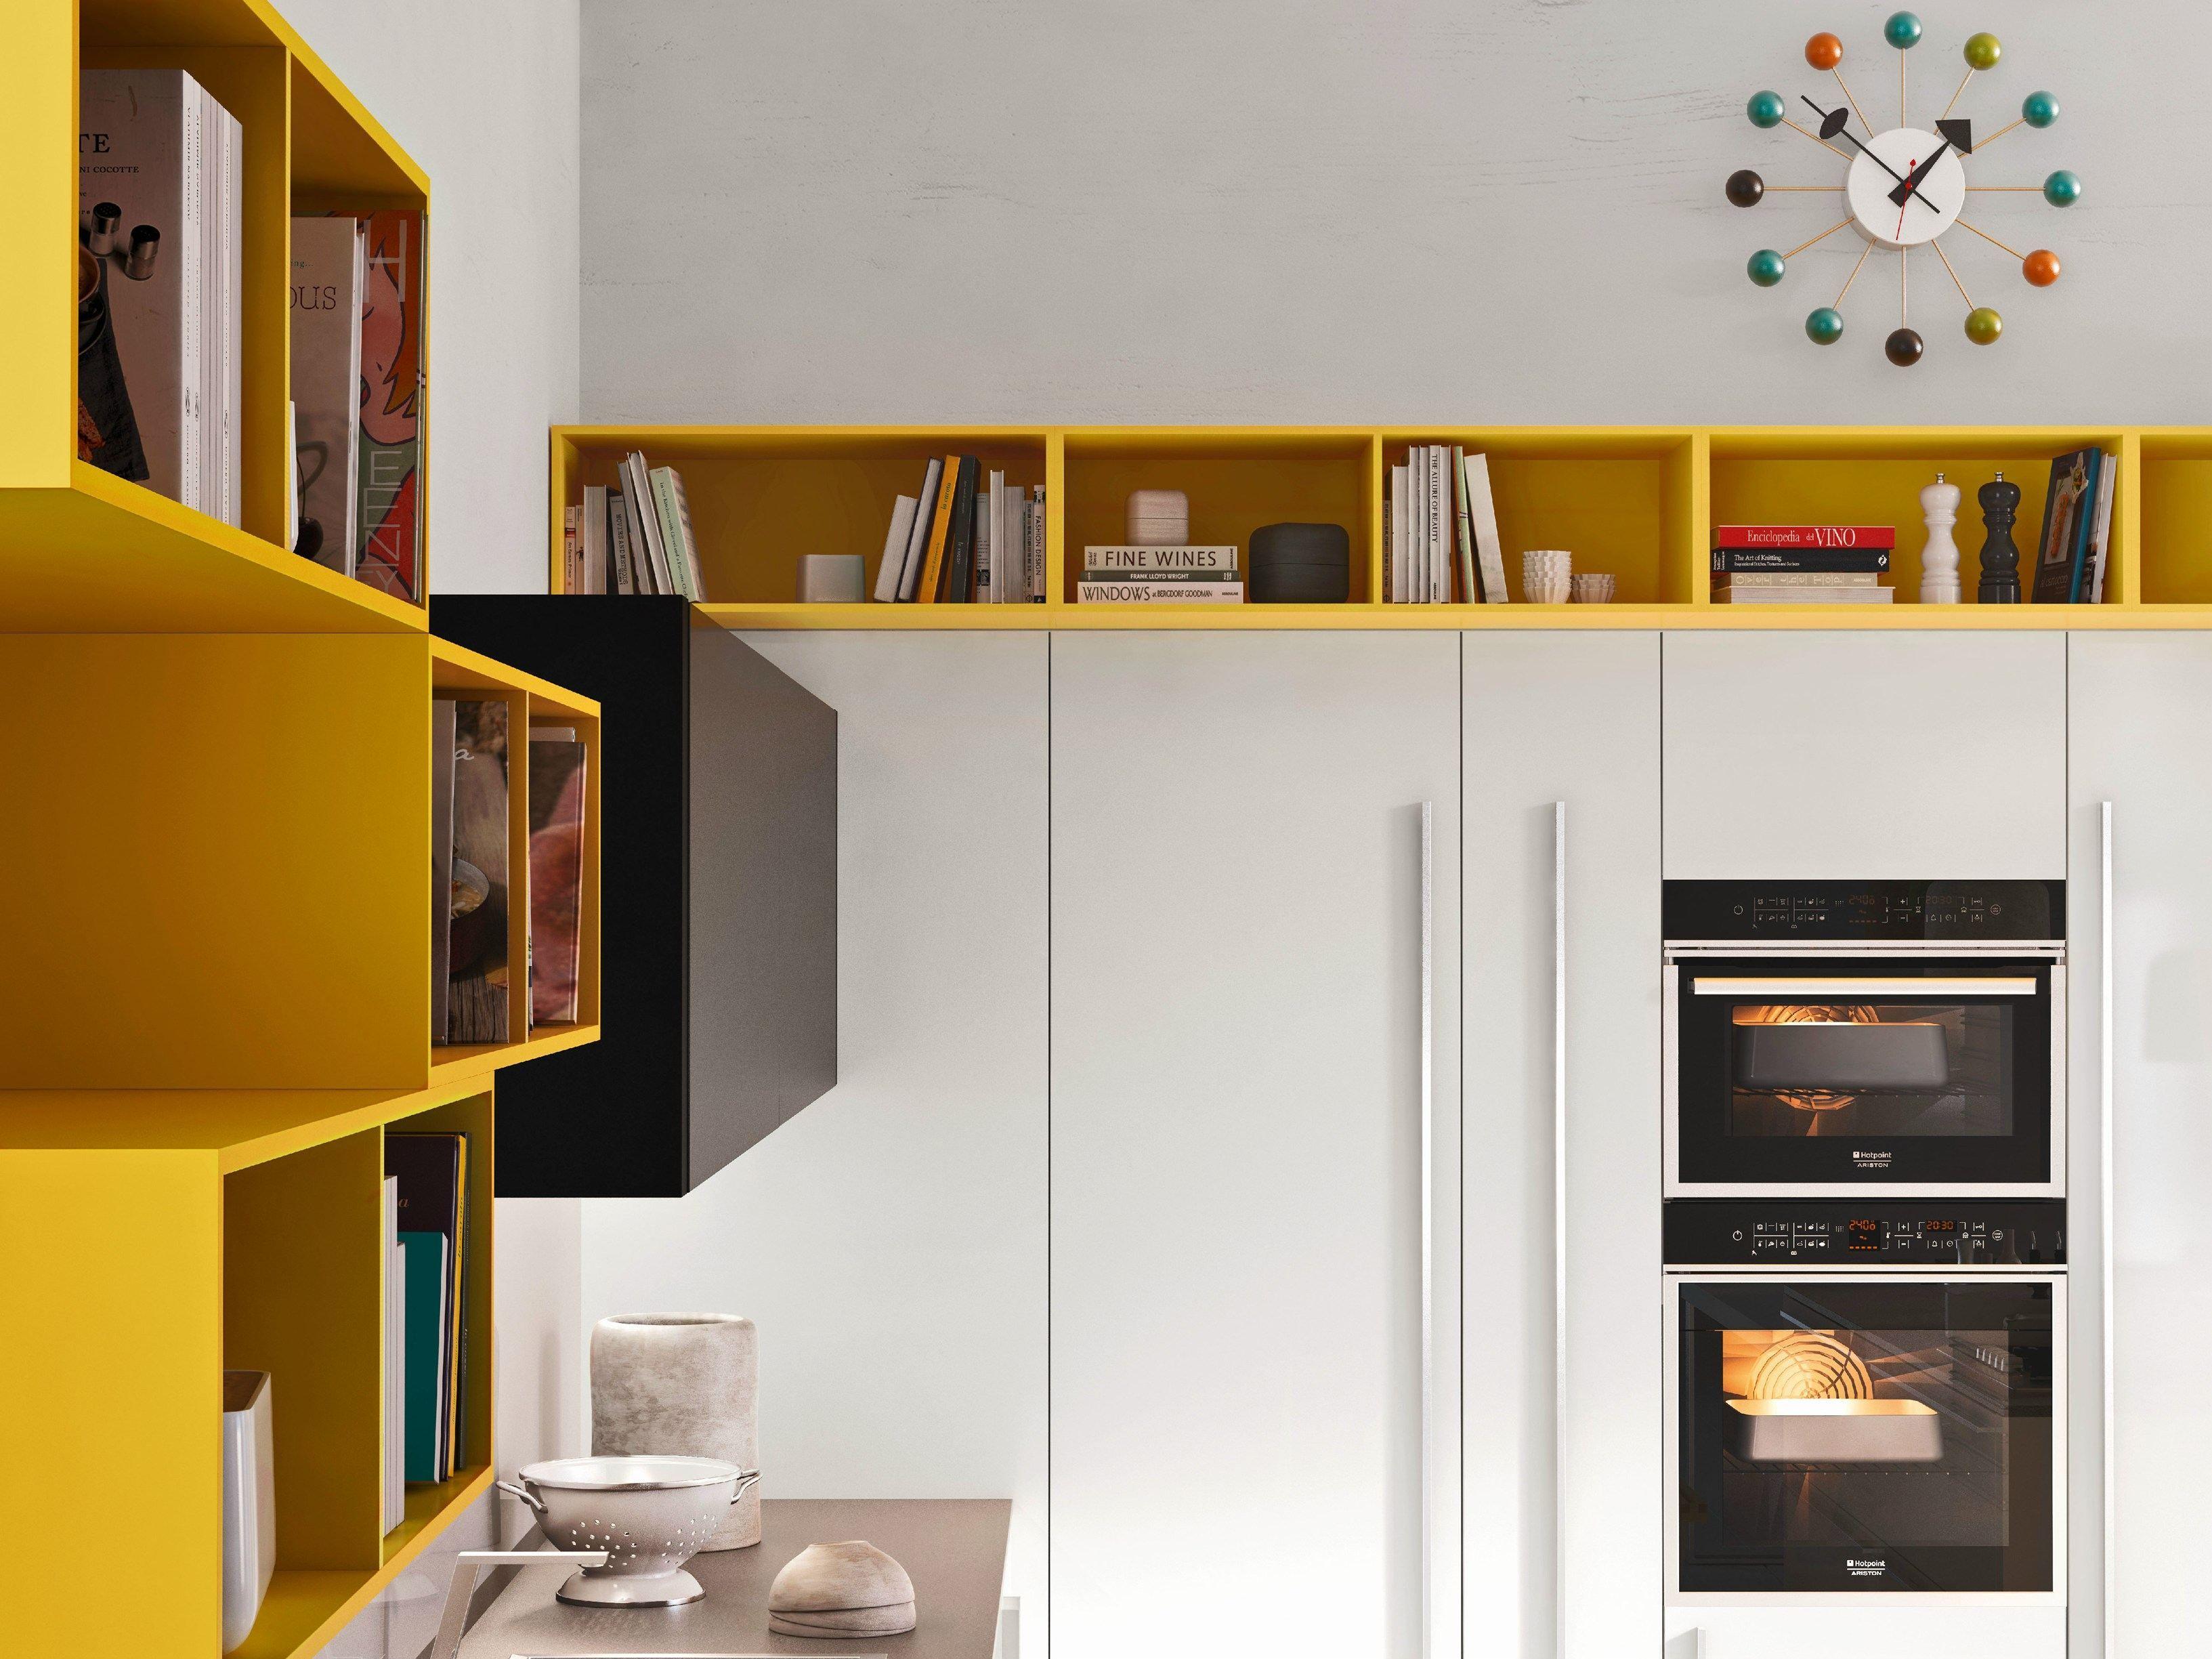 Code kitchen with island sistema collection by snaidero design michele marcon - Cucina code snaidero ...